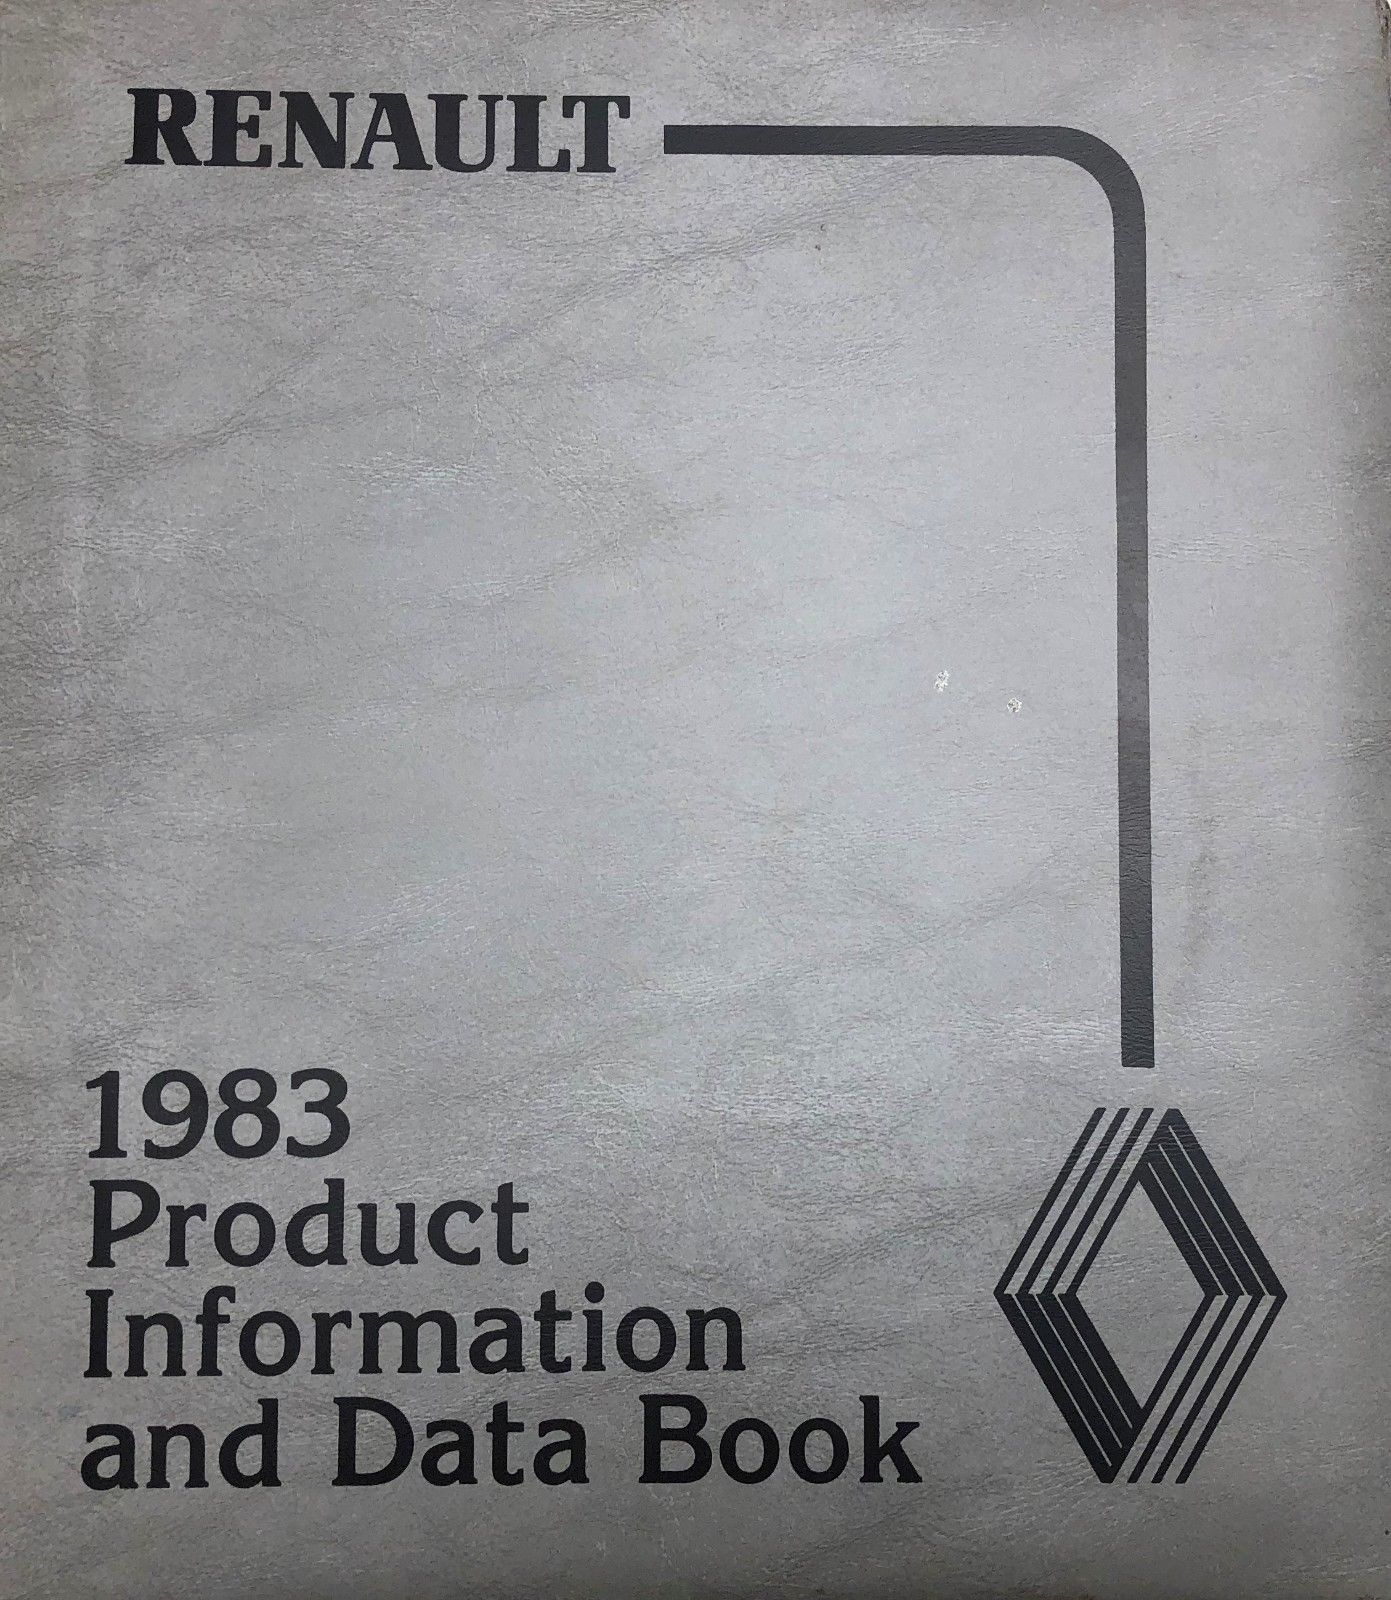 PIDB_1983